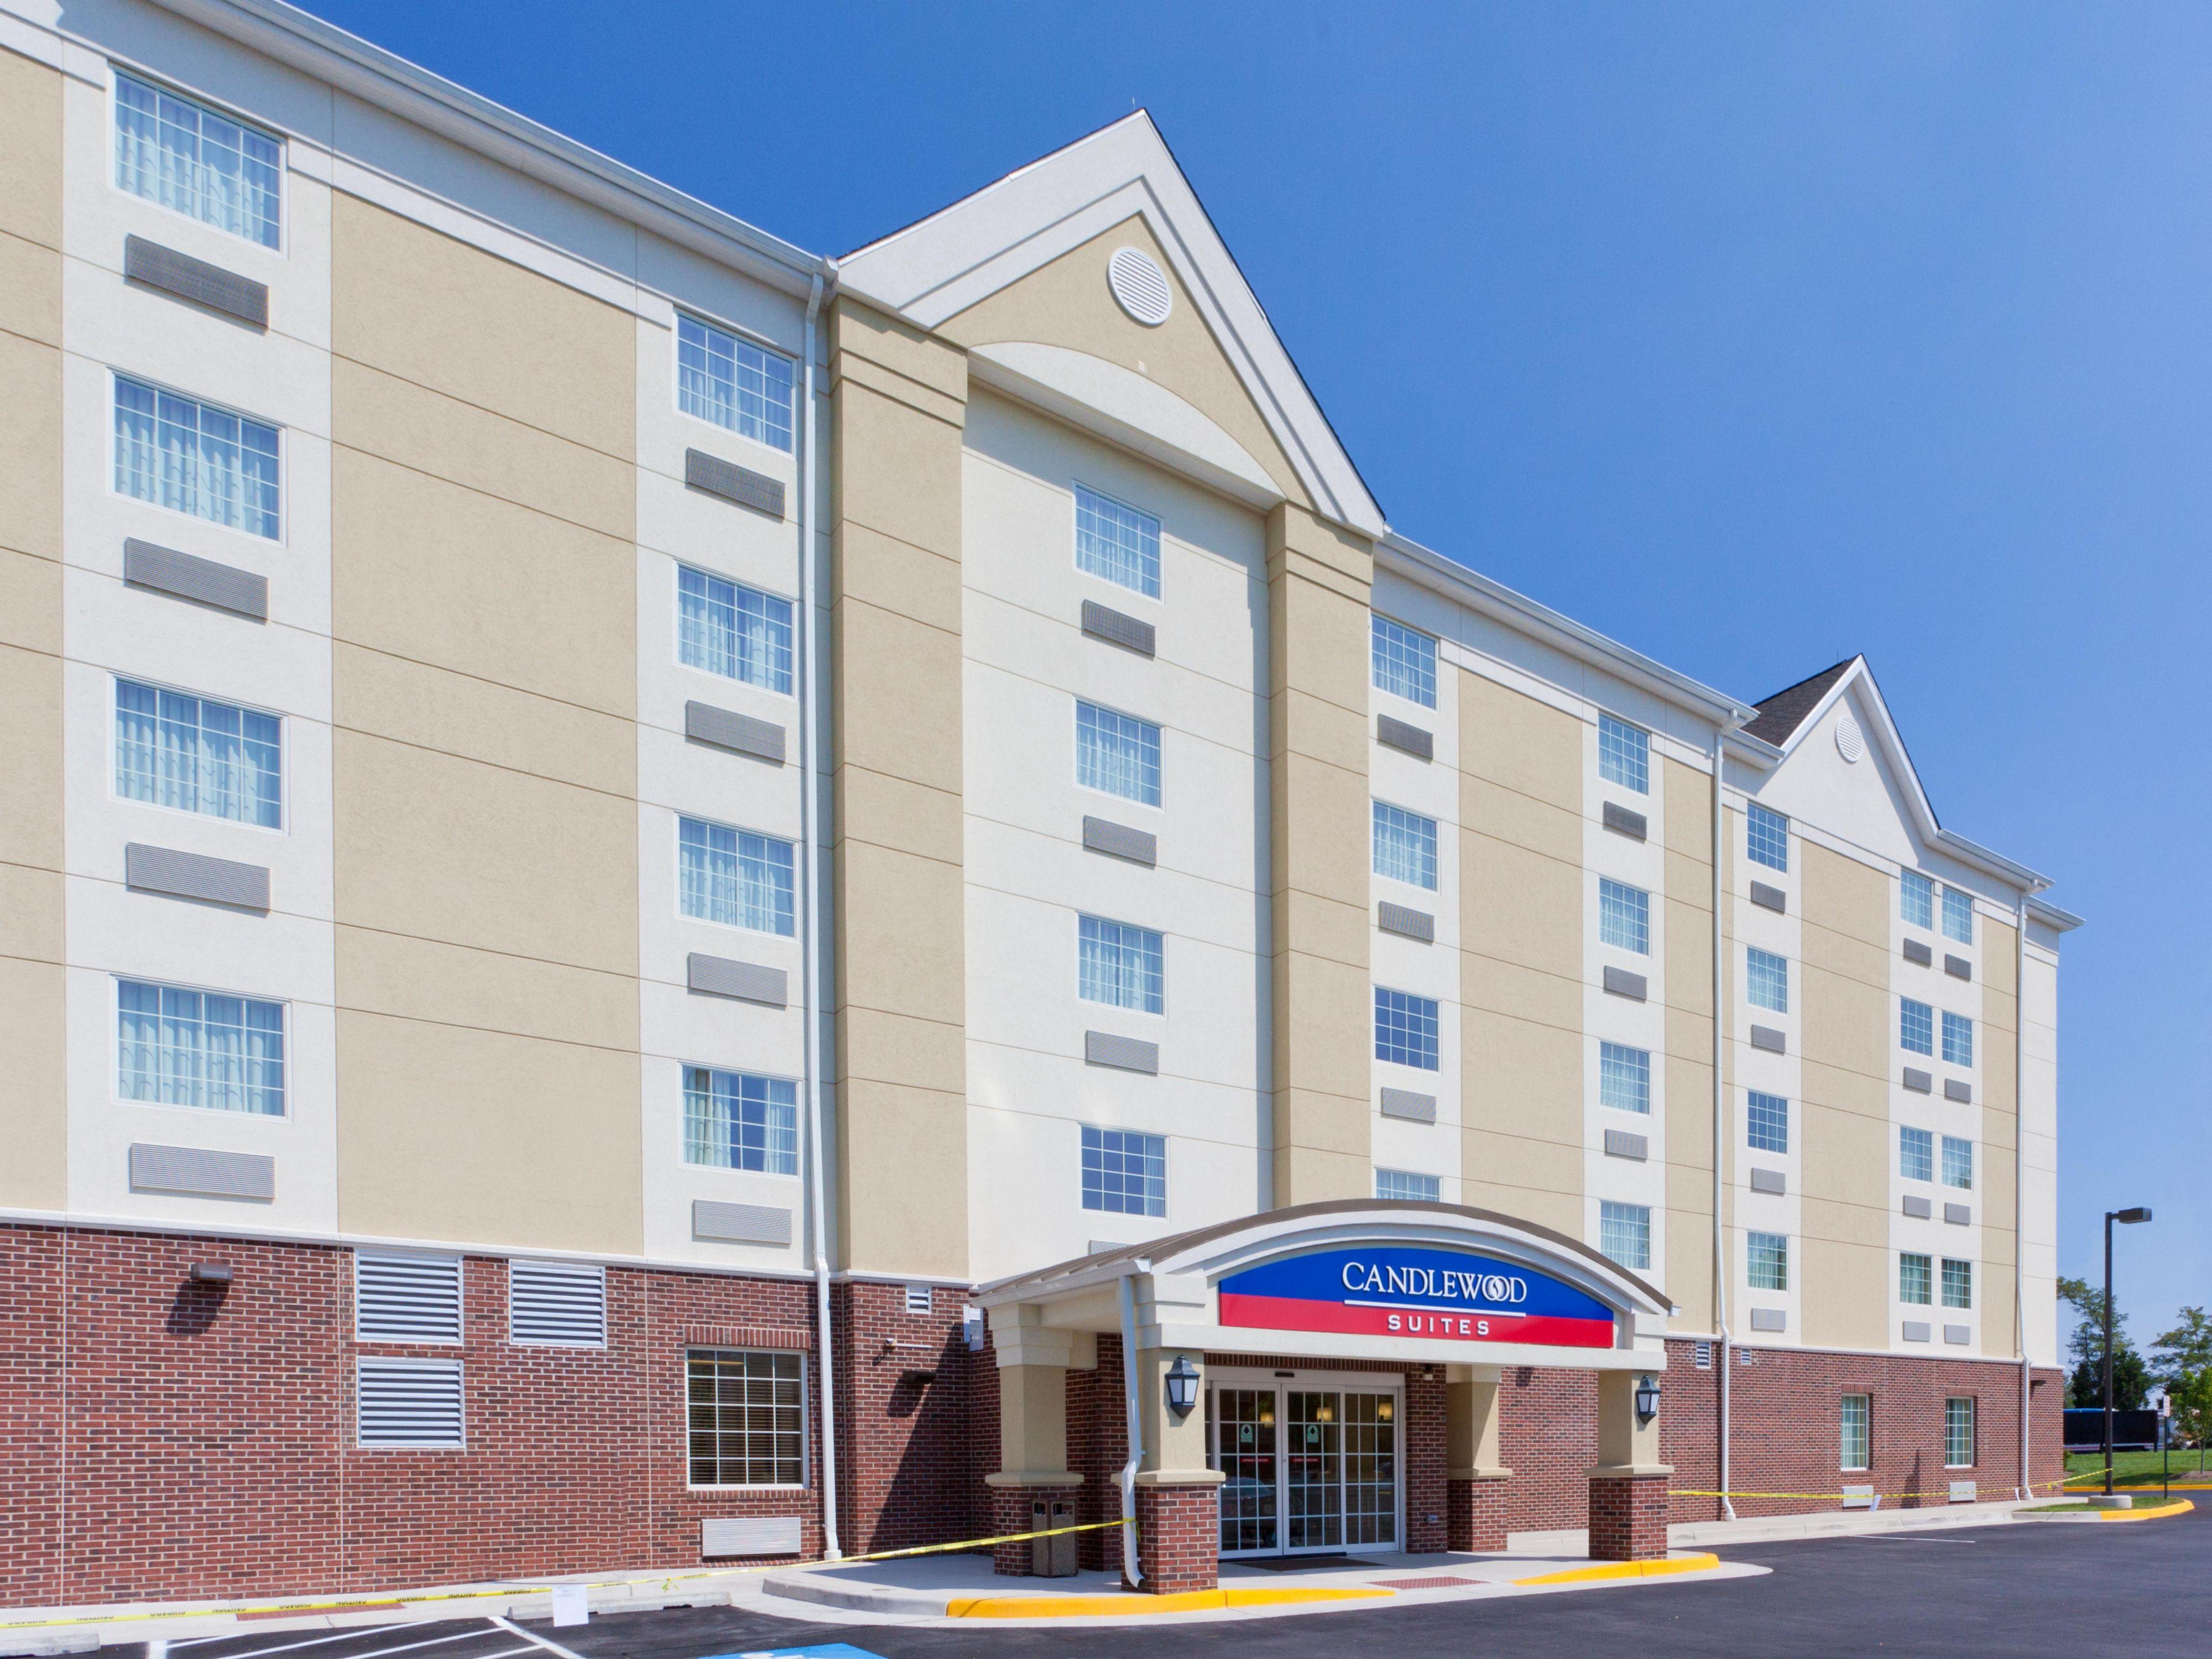 Manas Hotels